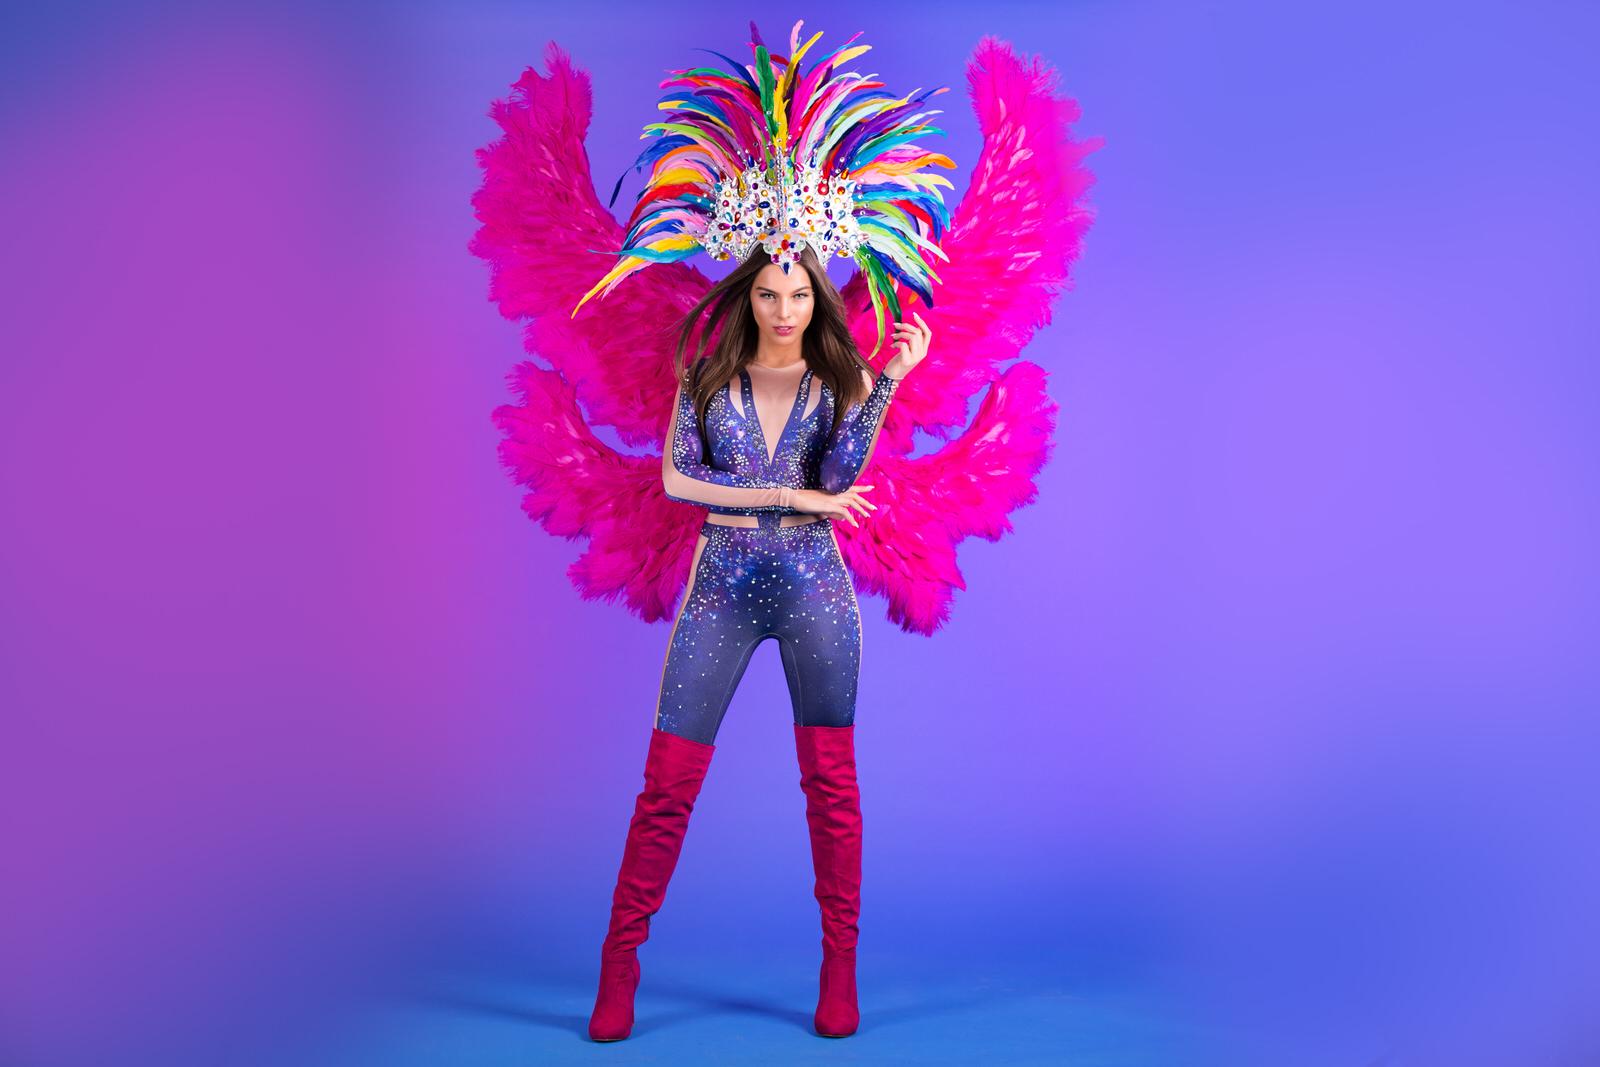 Purple dream, thema kostuum, colorfull angel, thema kostuum, entertainment, mobiel entertainment